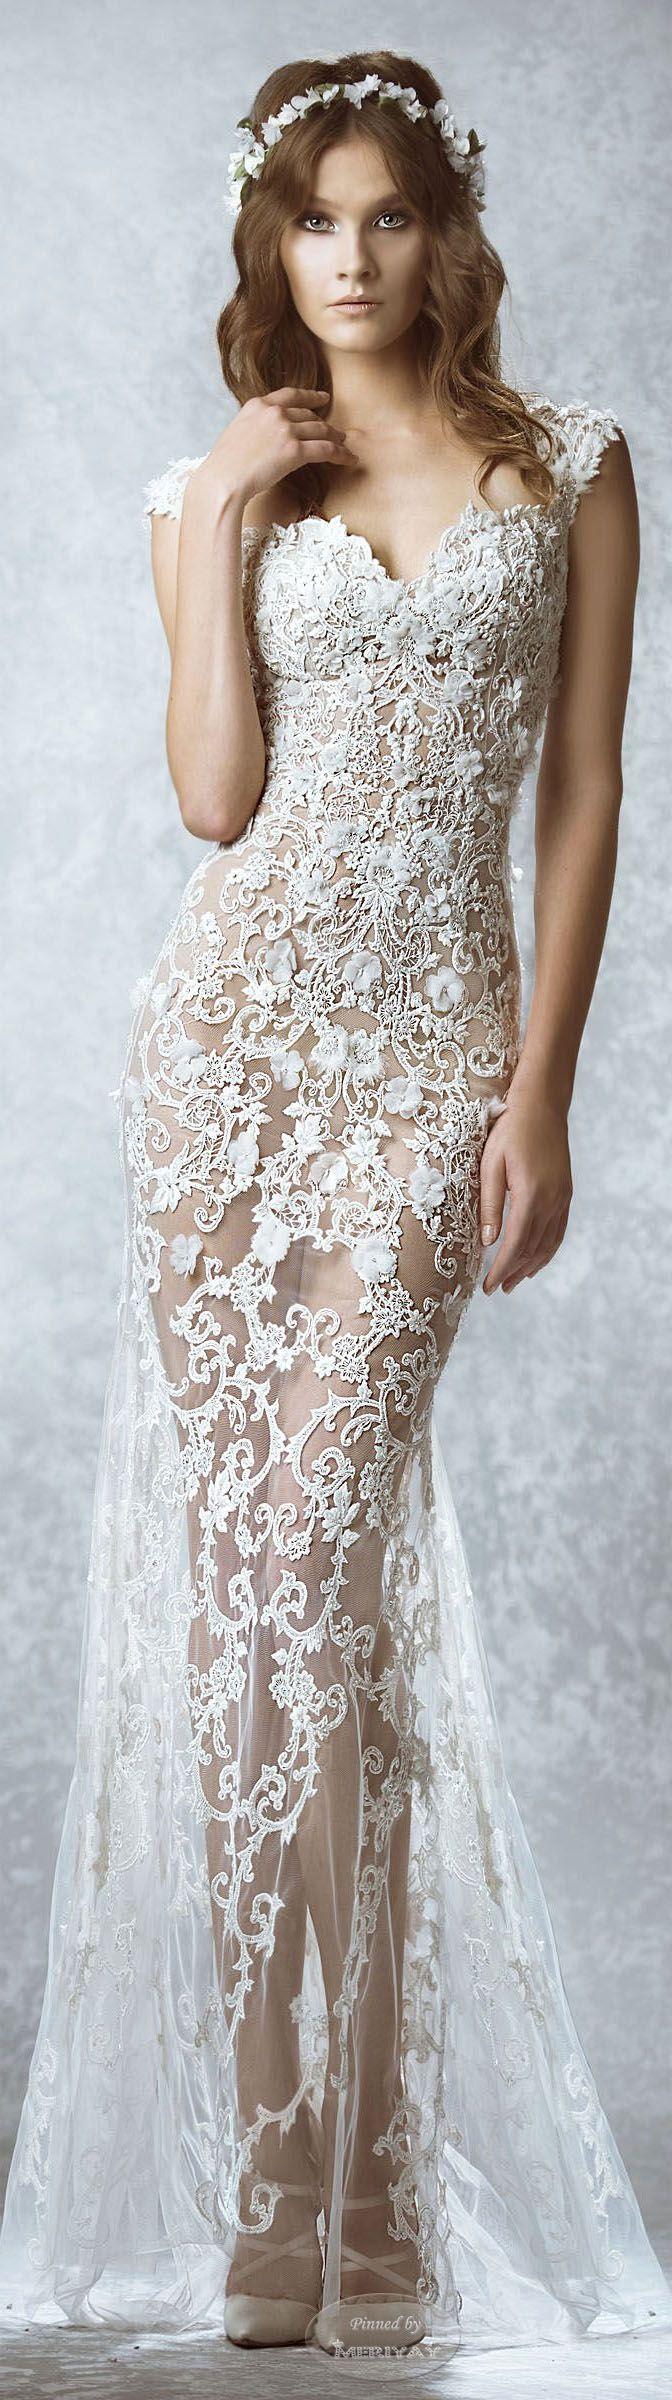 Wedding - Evening Gowns/Dresses